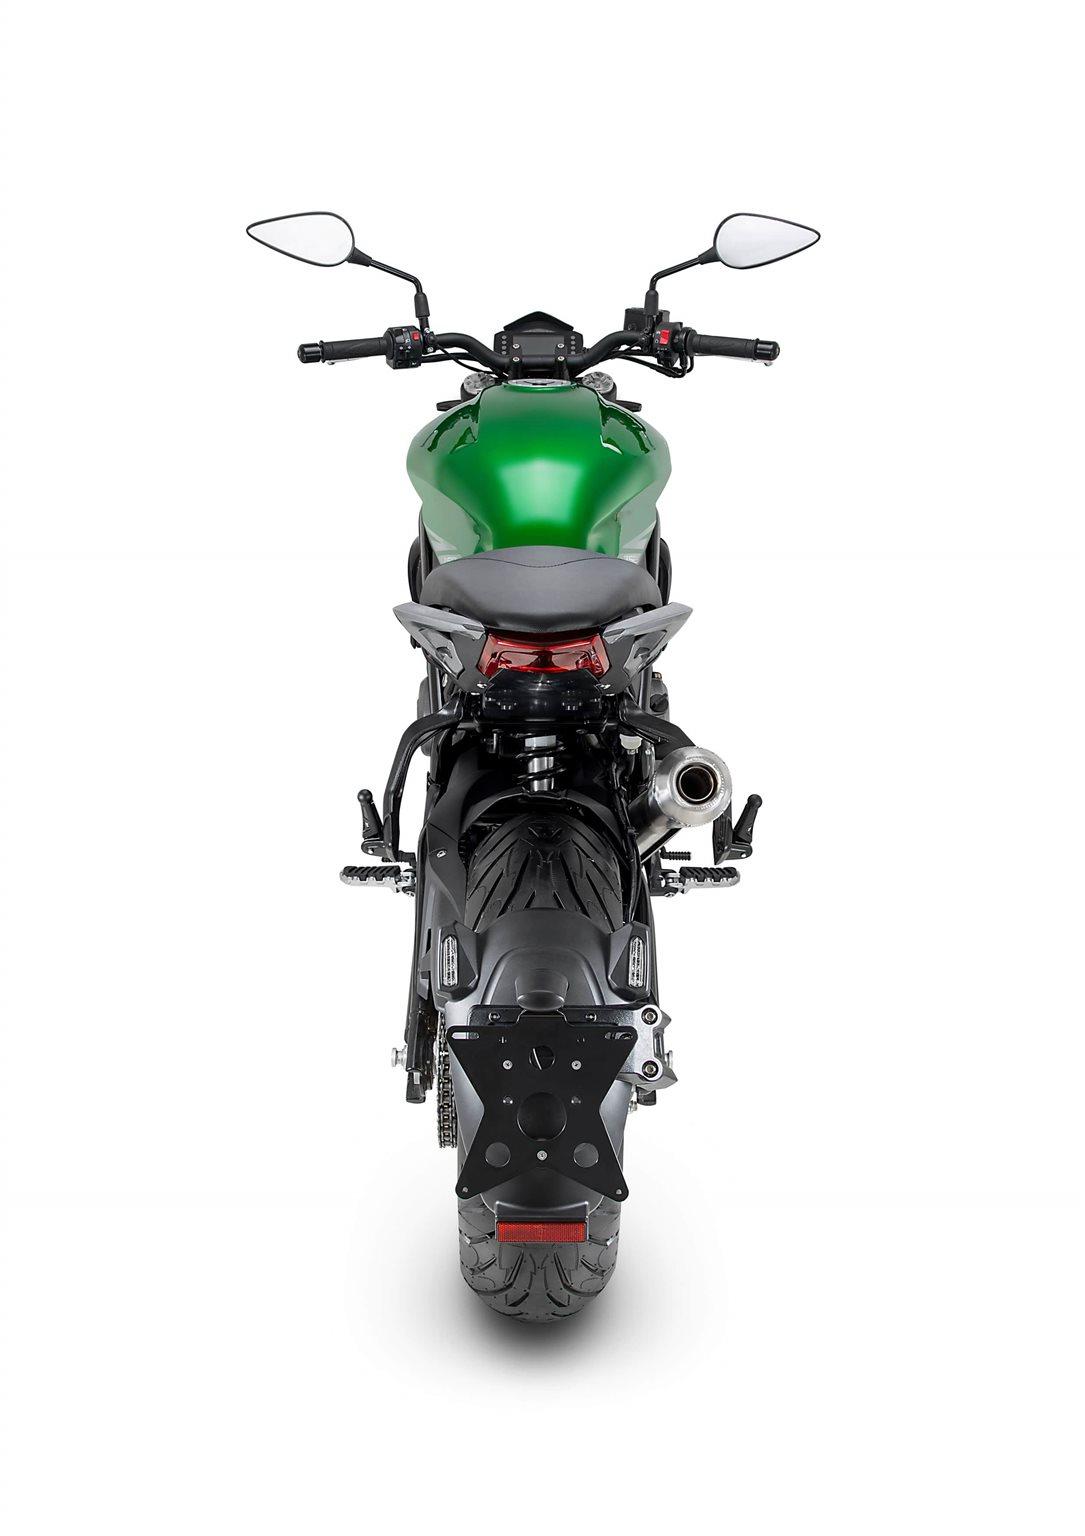 Benelli 752 S Motorrad, neu